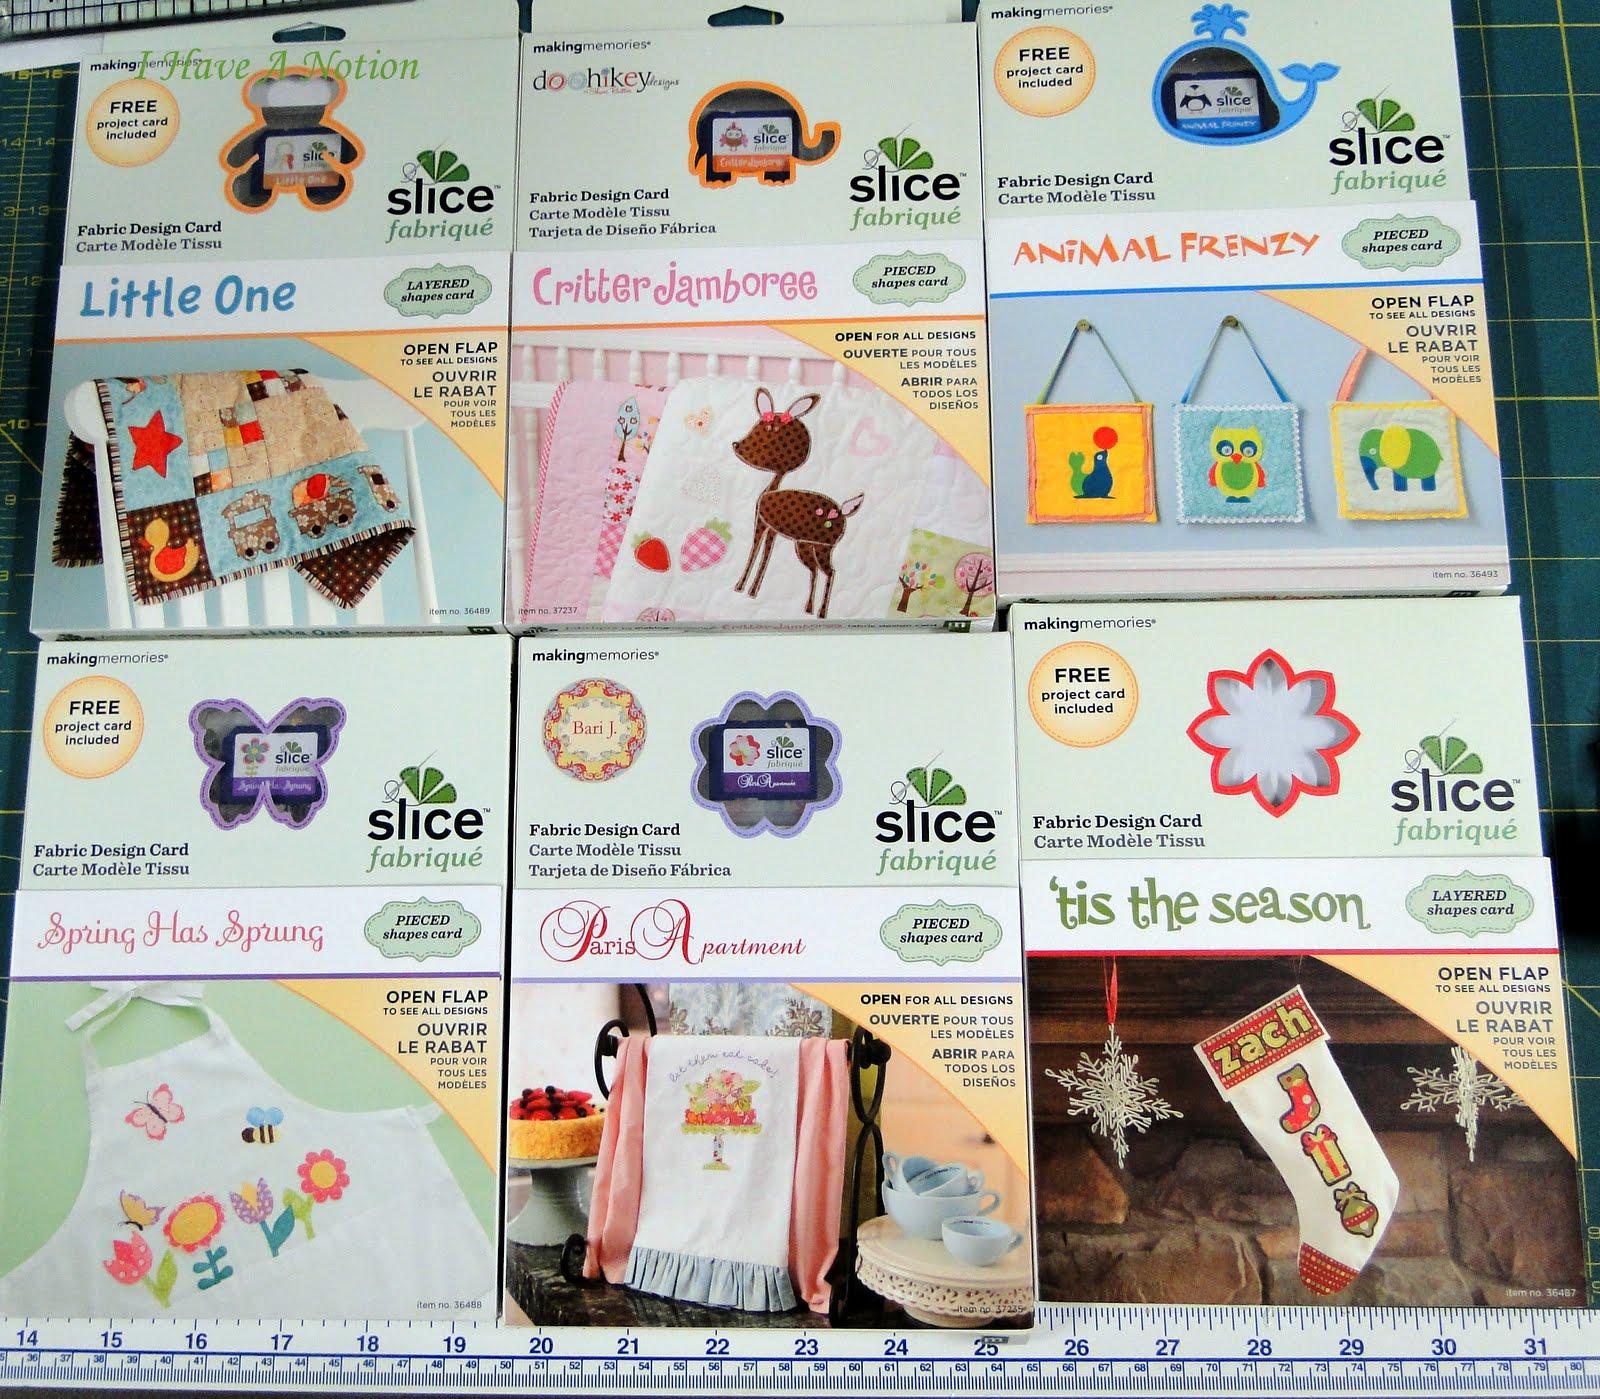 Slice Fabrique Design Cards